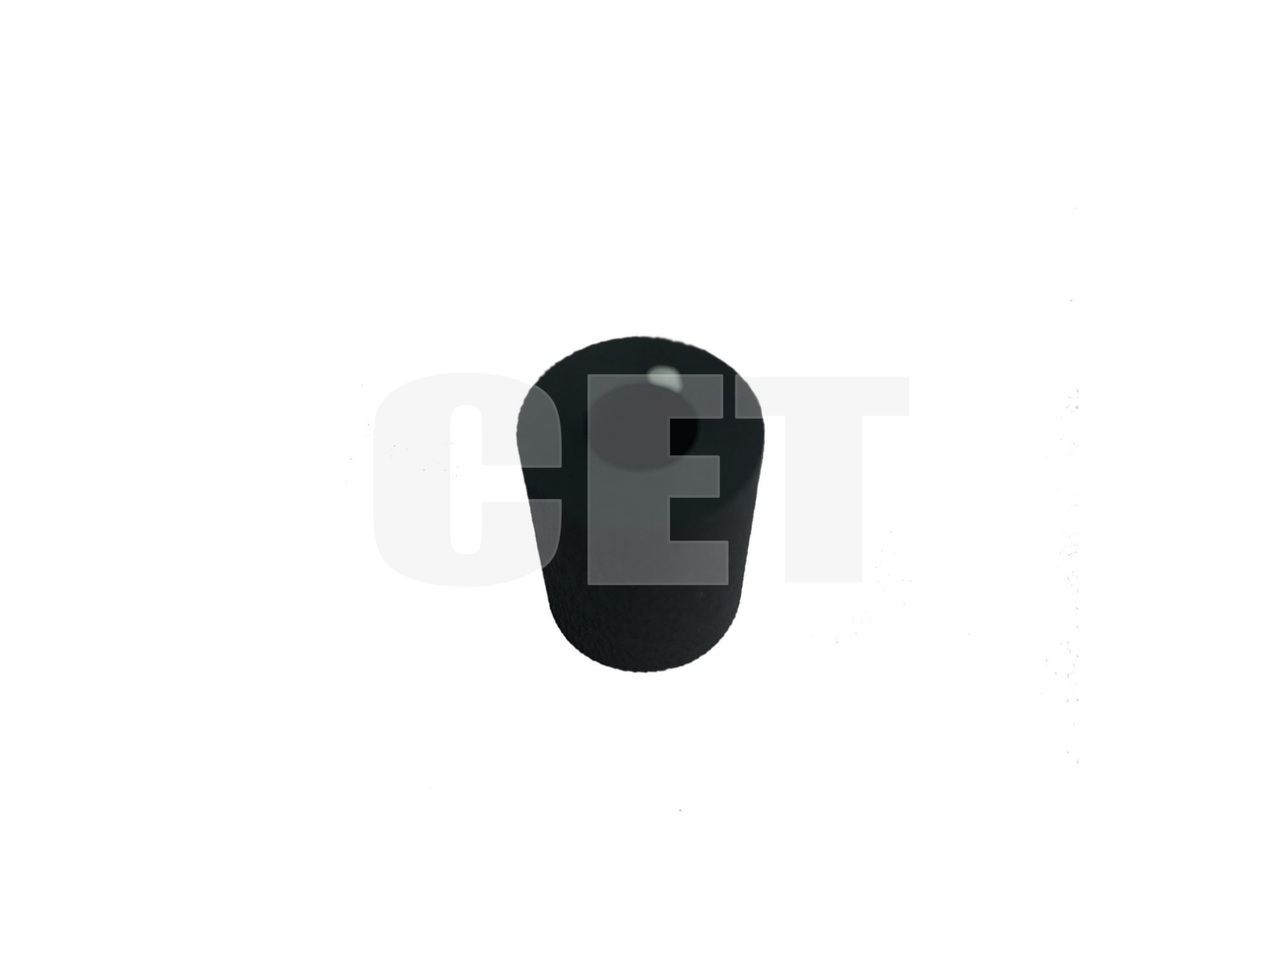 Резинка ролика подхвата 2HN06080 для KYOCERAFS-6025MFP/TASKalfa 255/305 (CET), CET7806BPT